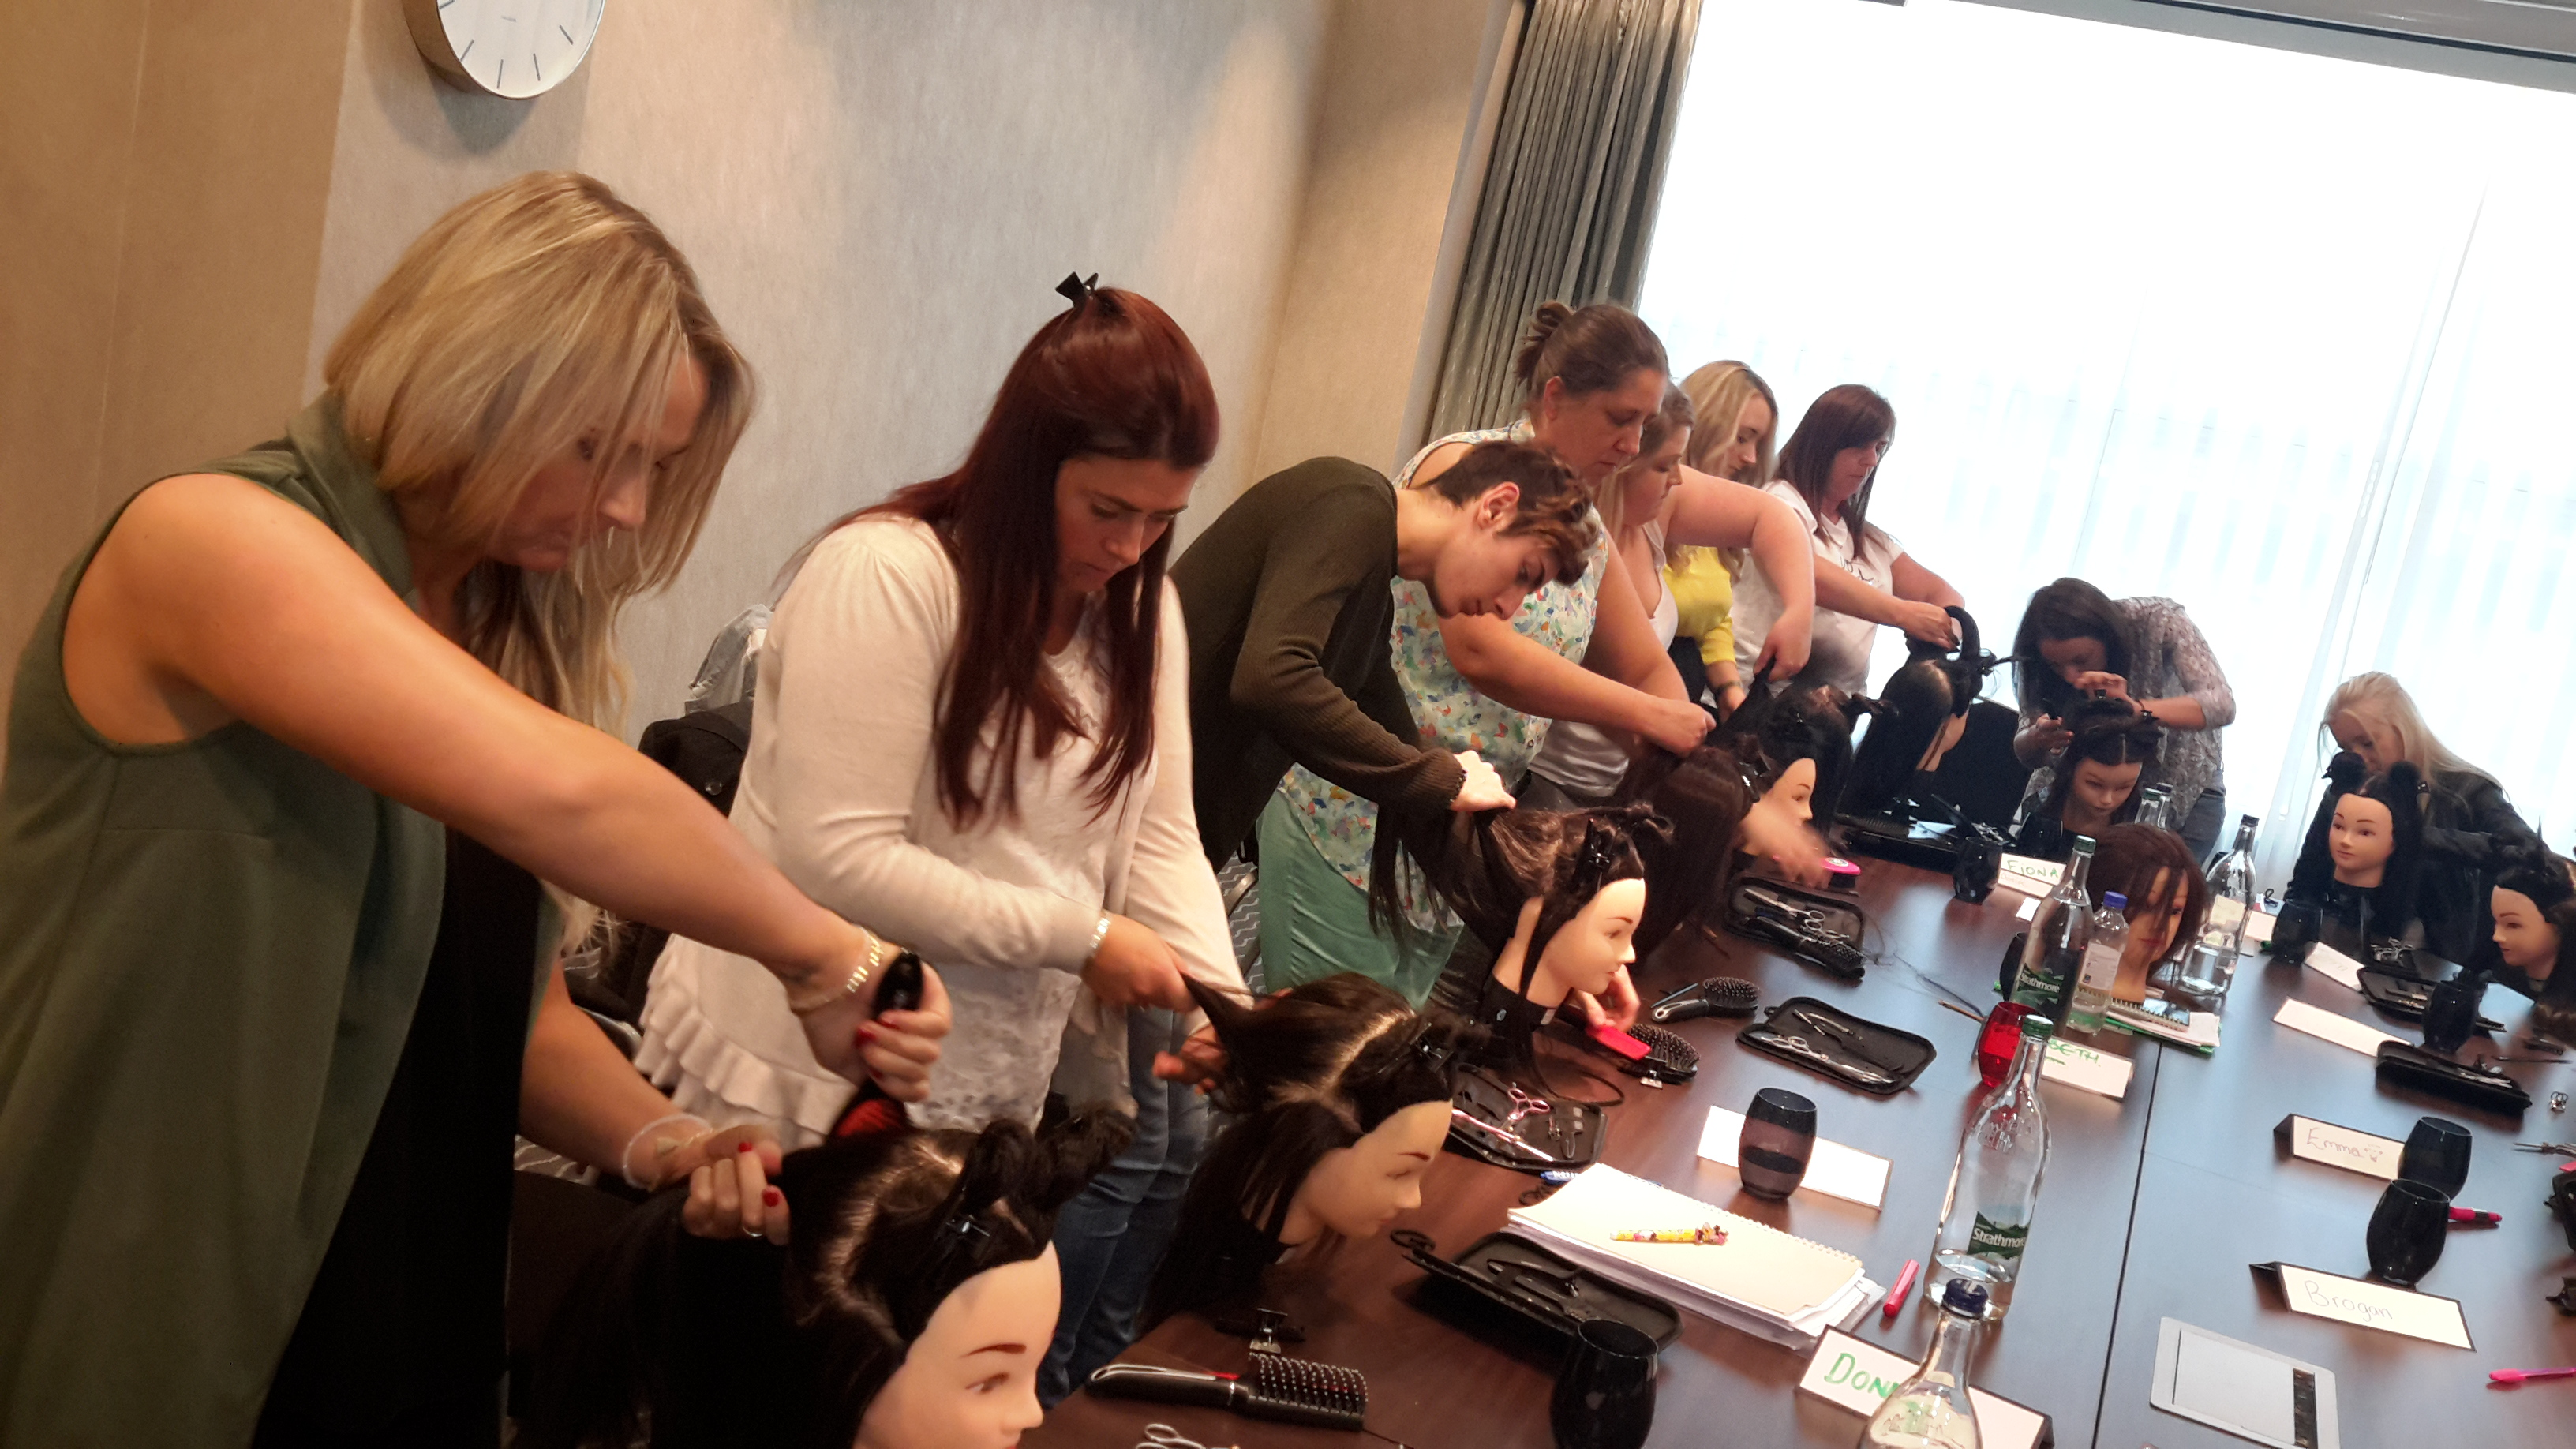 Glasgow Hair Extension training academy diane shawe 2015-09-07 17.51 (30)